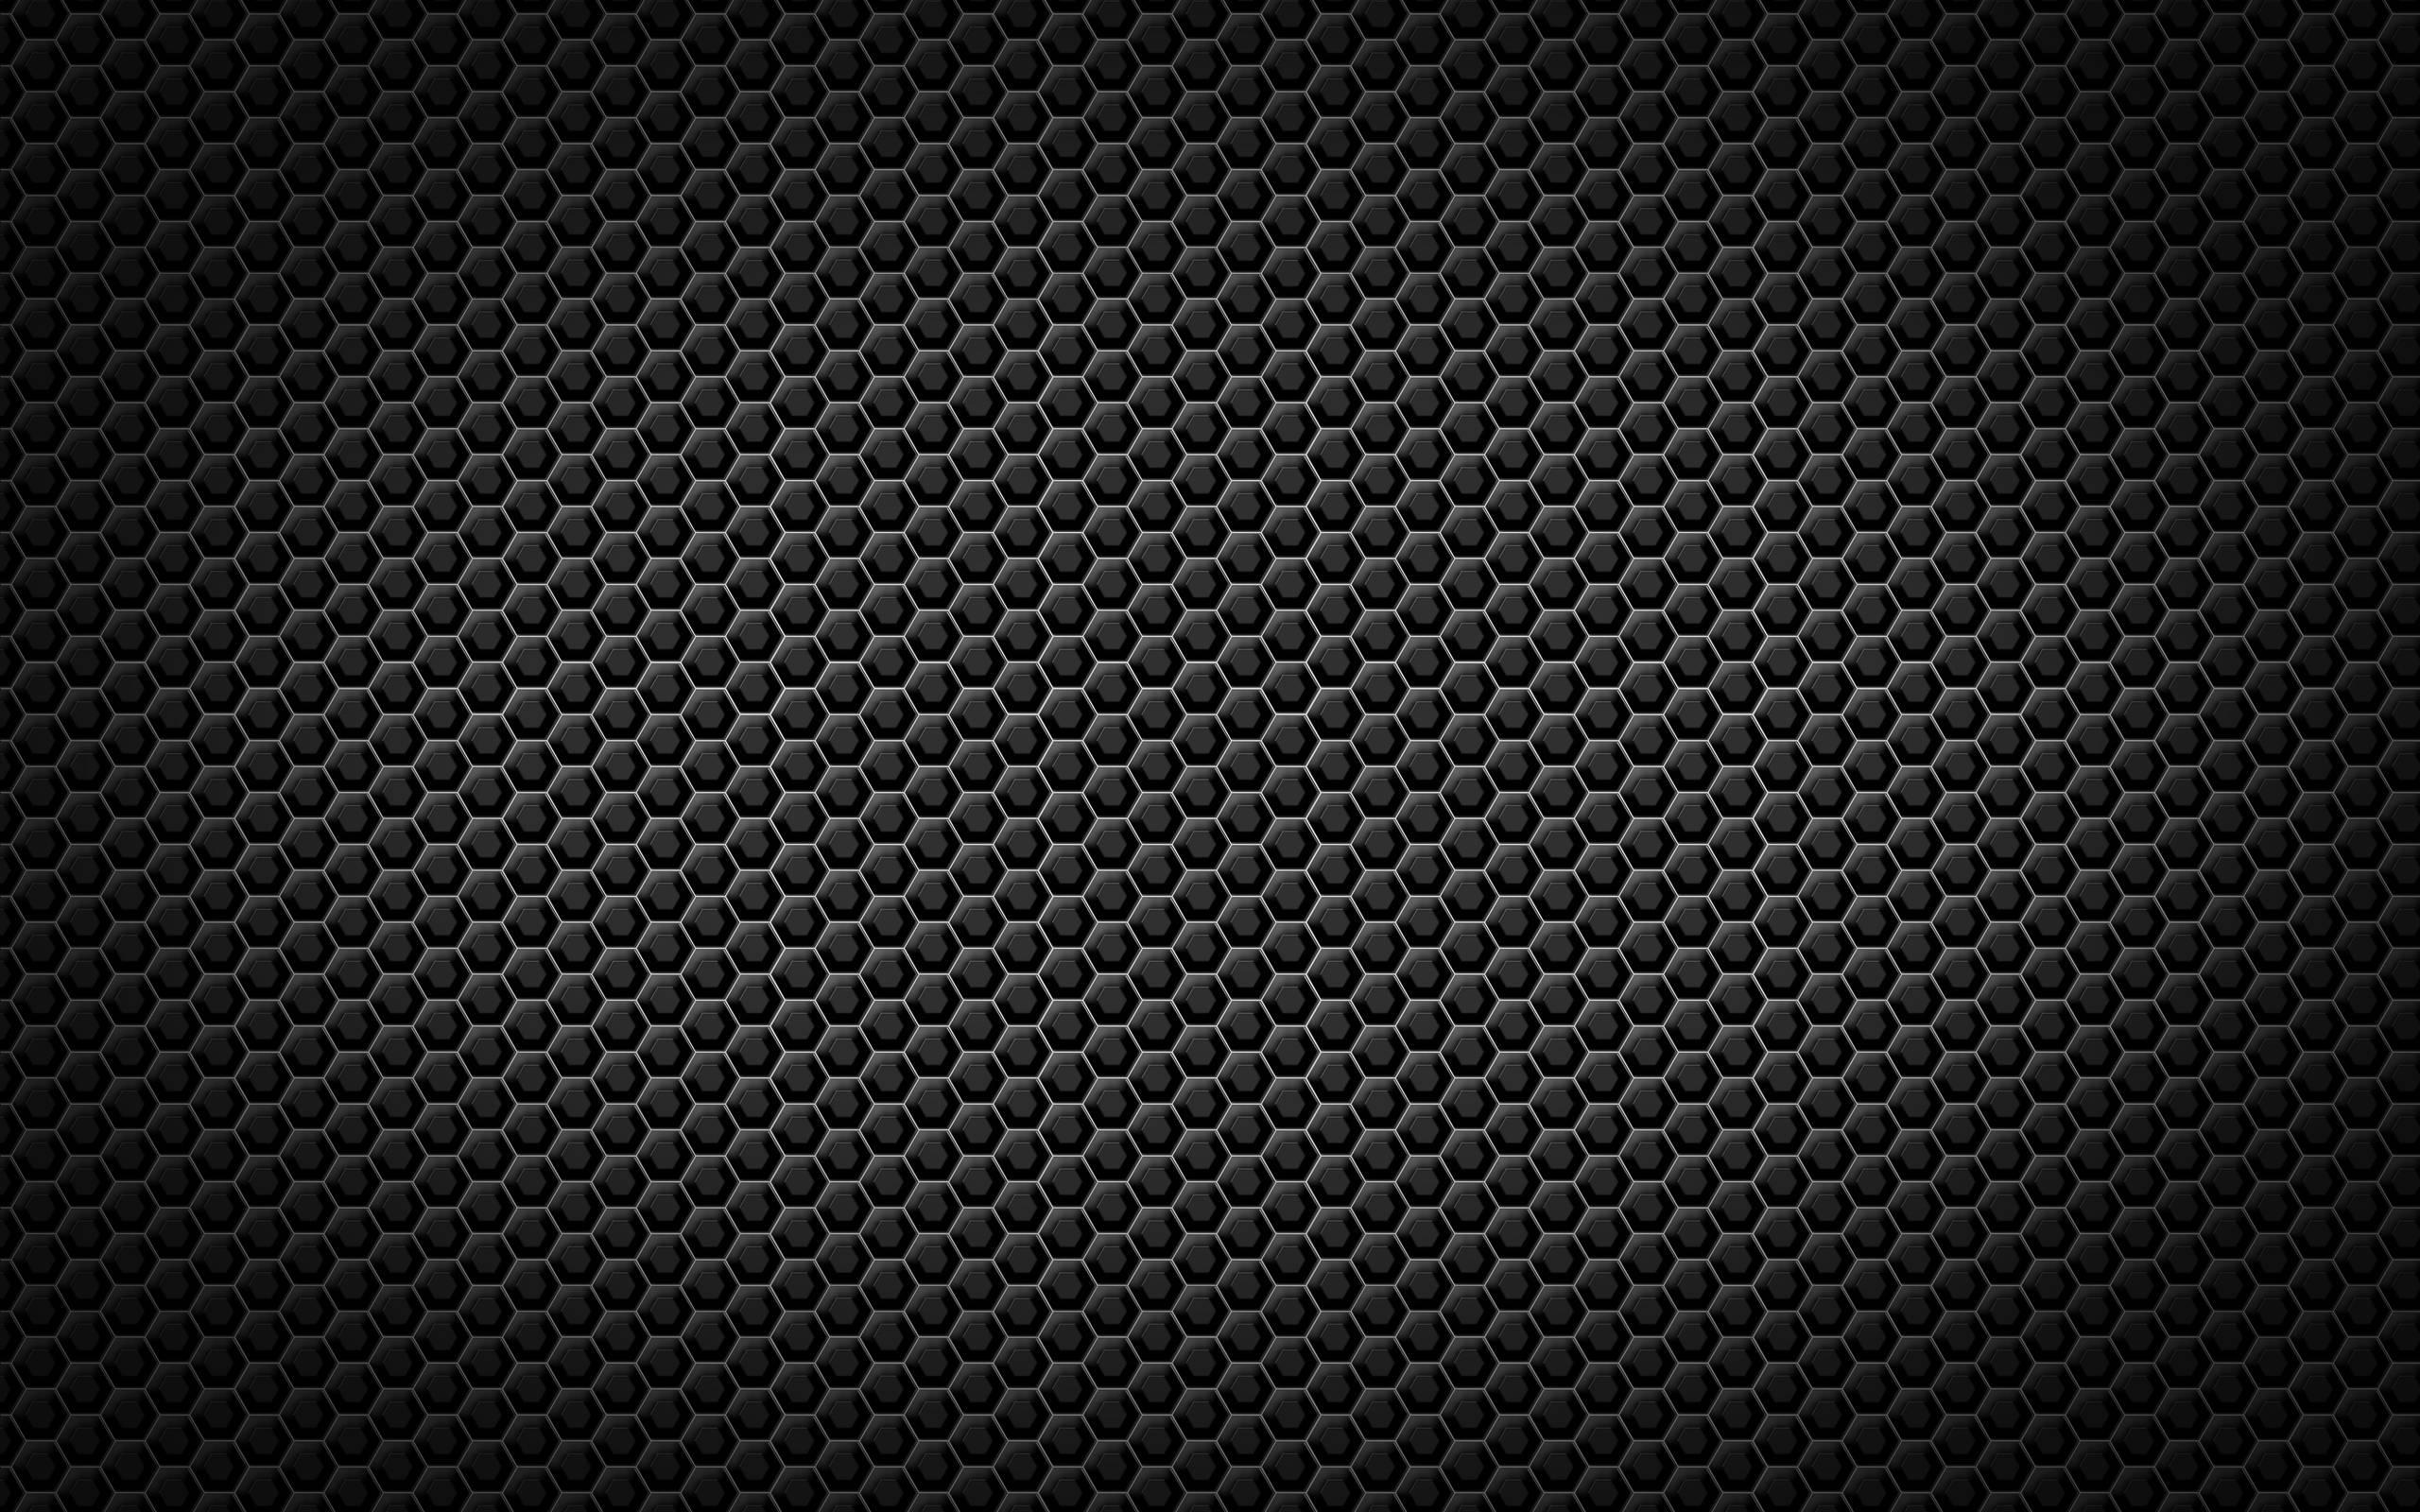 Black Wallpapers Image - Wallpaper Cave